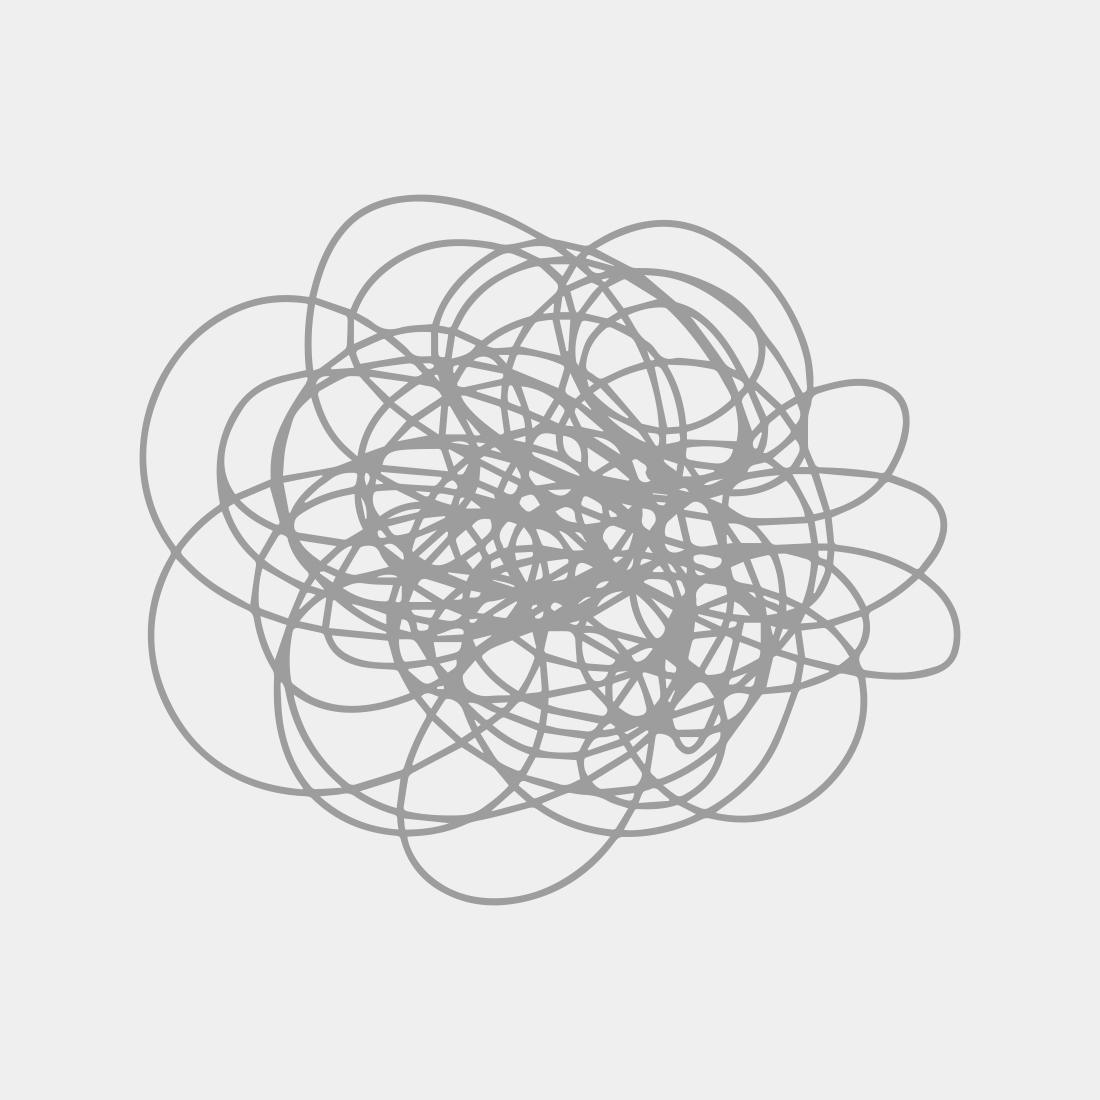 Albert Irvin OBE RA Untitled opus w.35